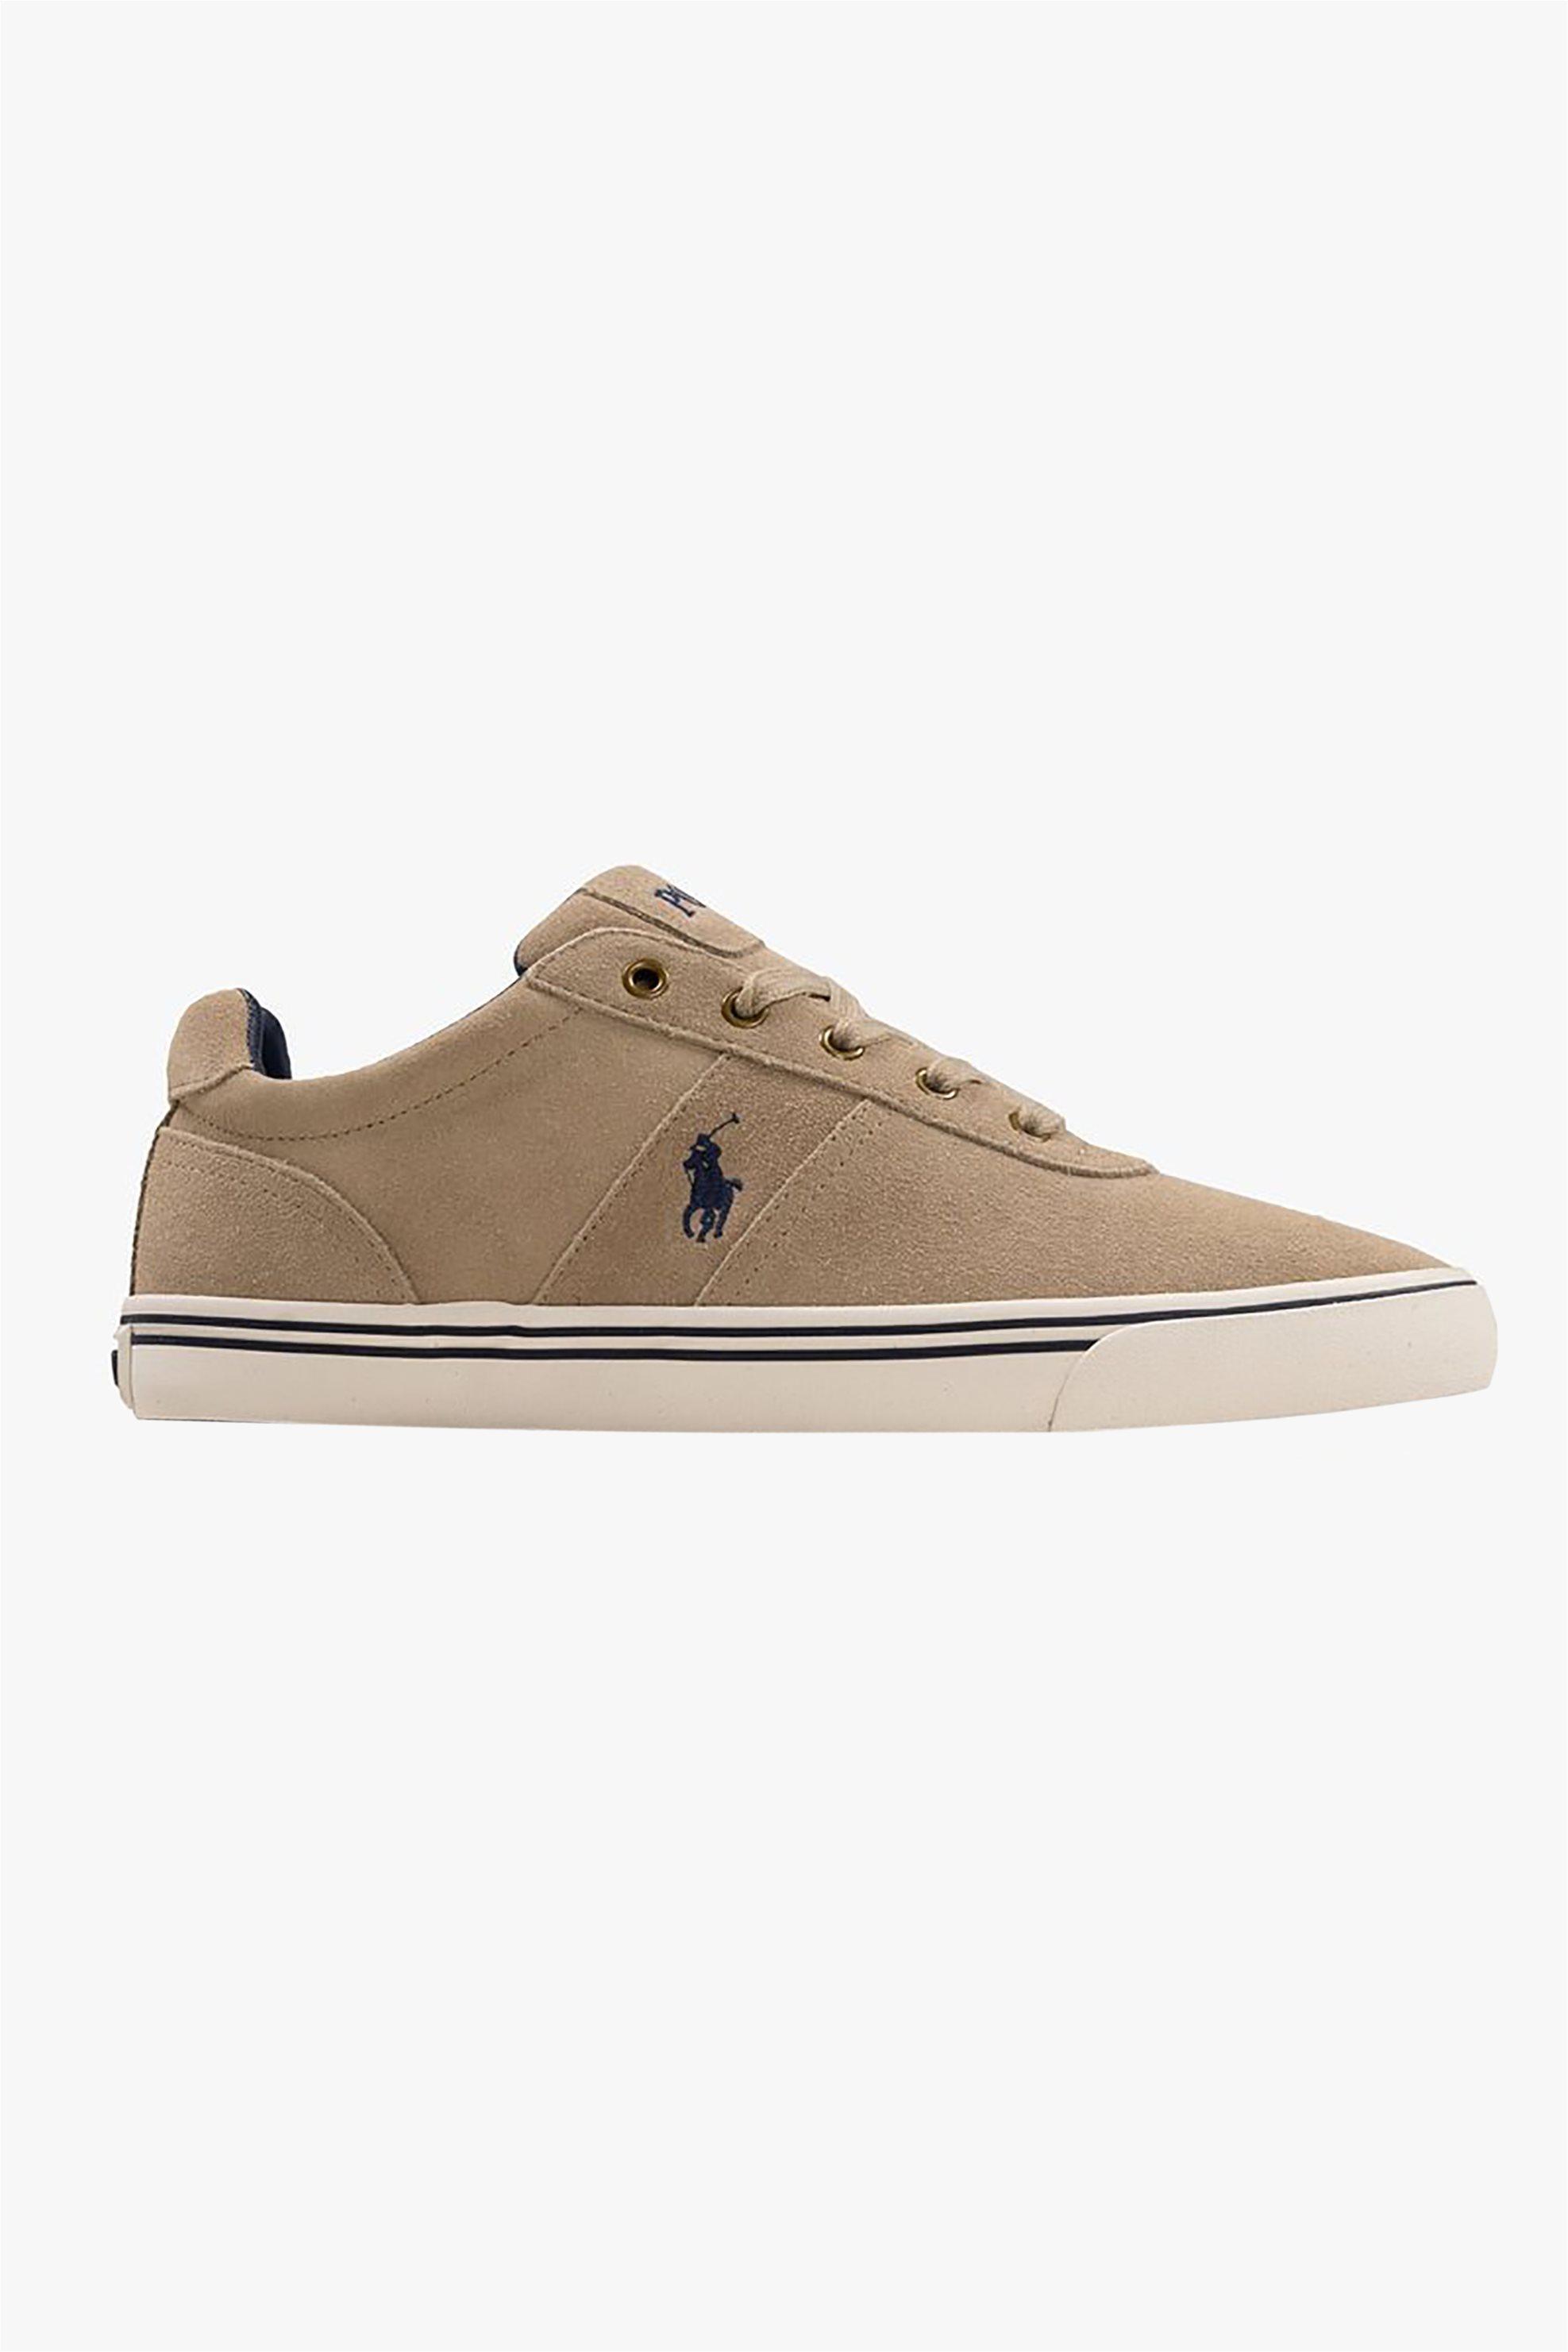 "Polo Ralph Lauren ανδρικά suede sneakers με κορδόνια ""Hanford"" – 816641859005 – Μπεζ"